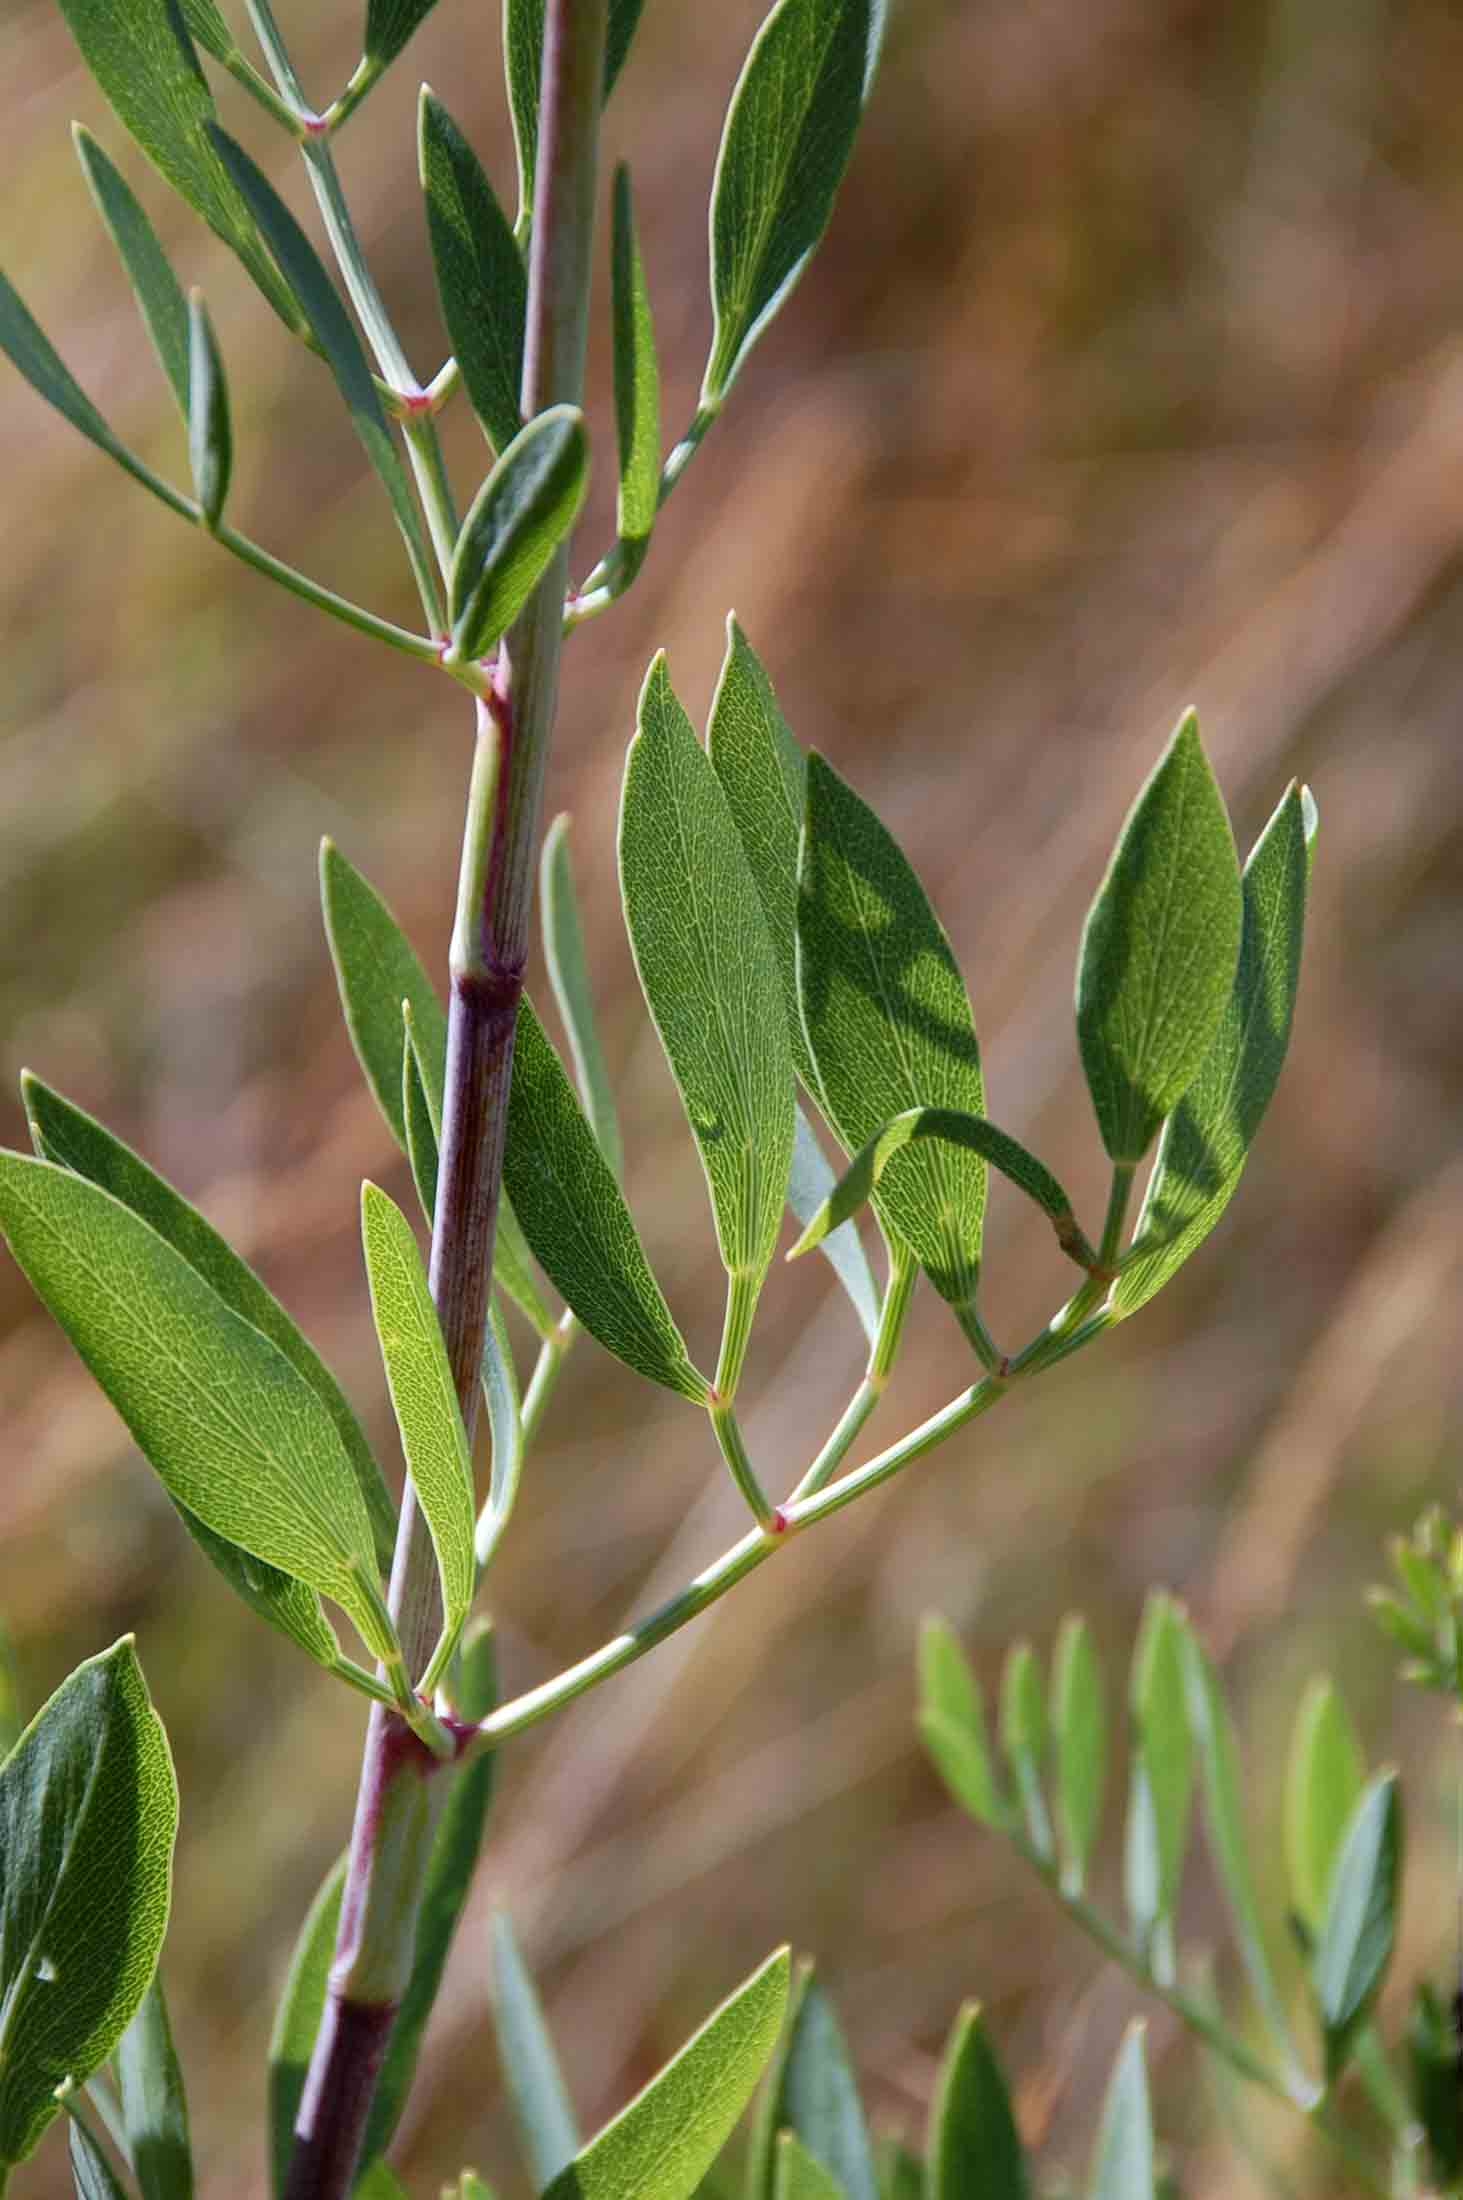 Diplolophium buchananii subsp. swynnertonii